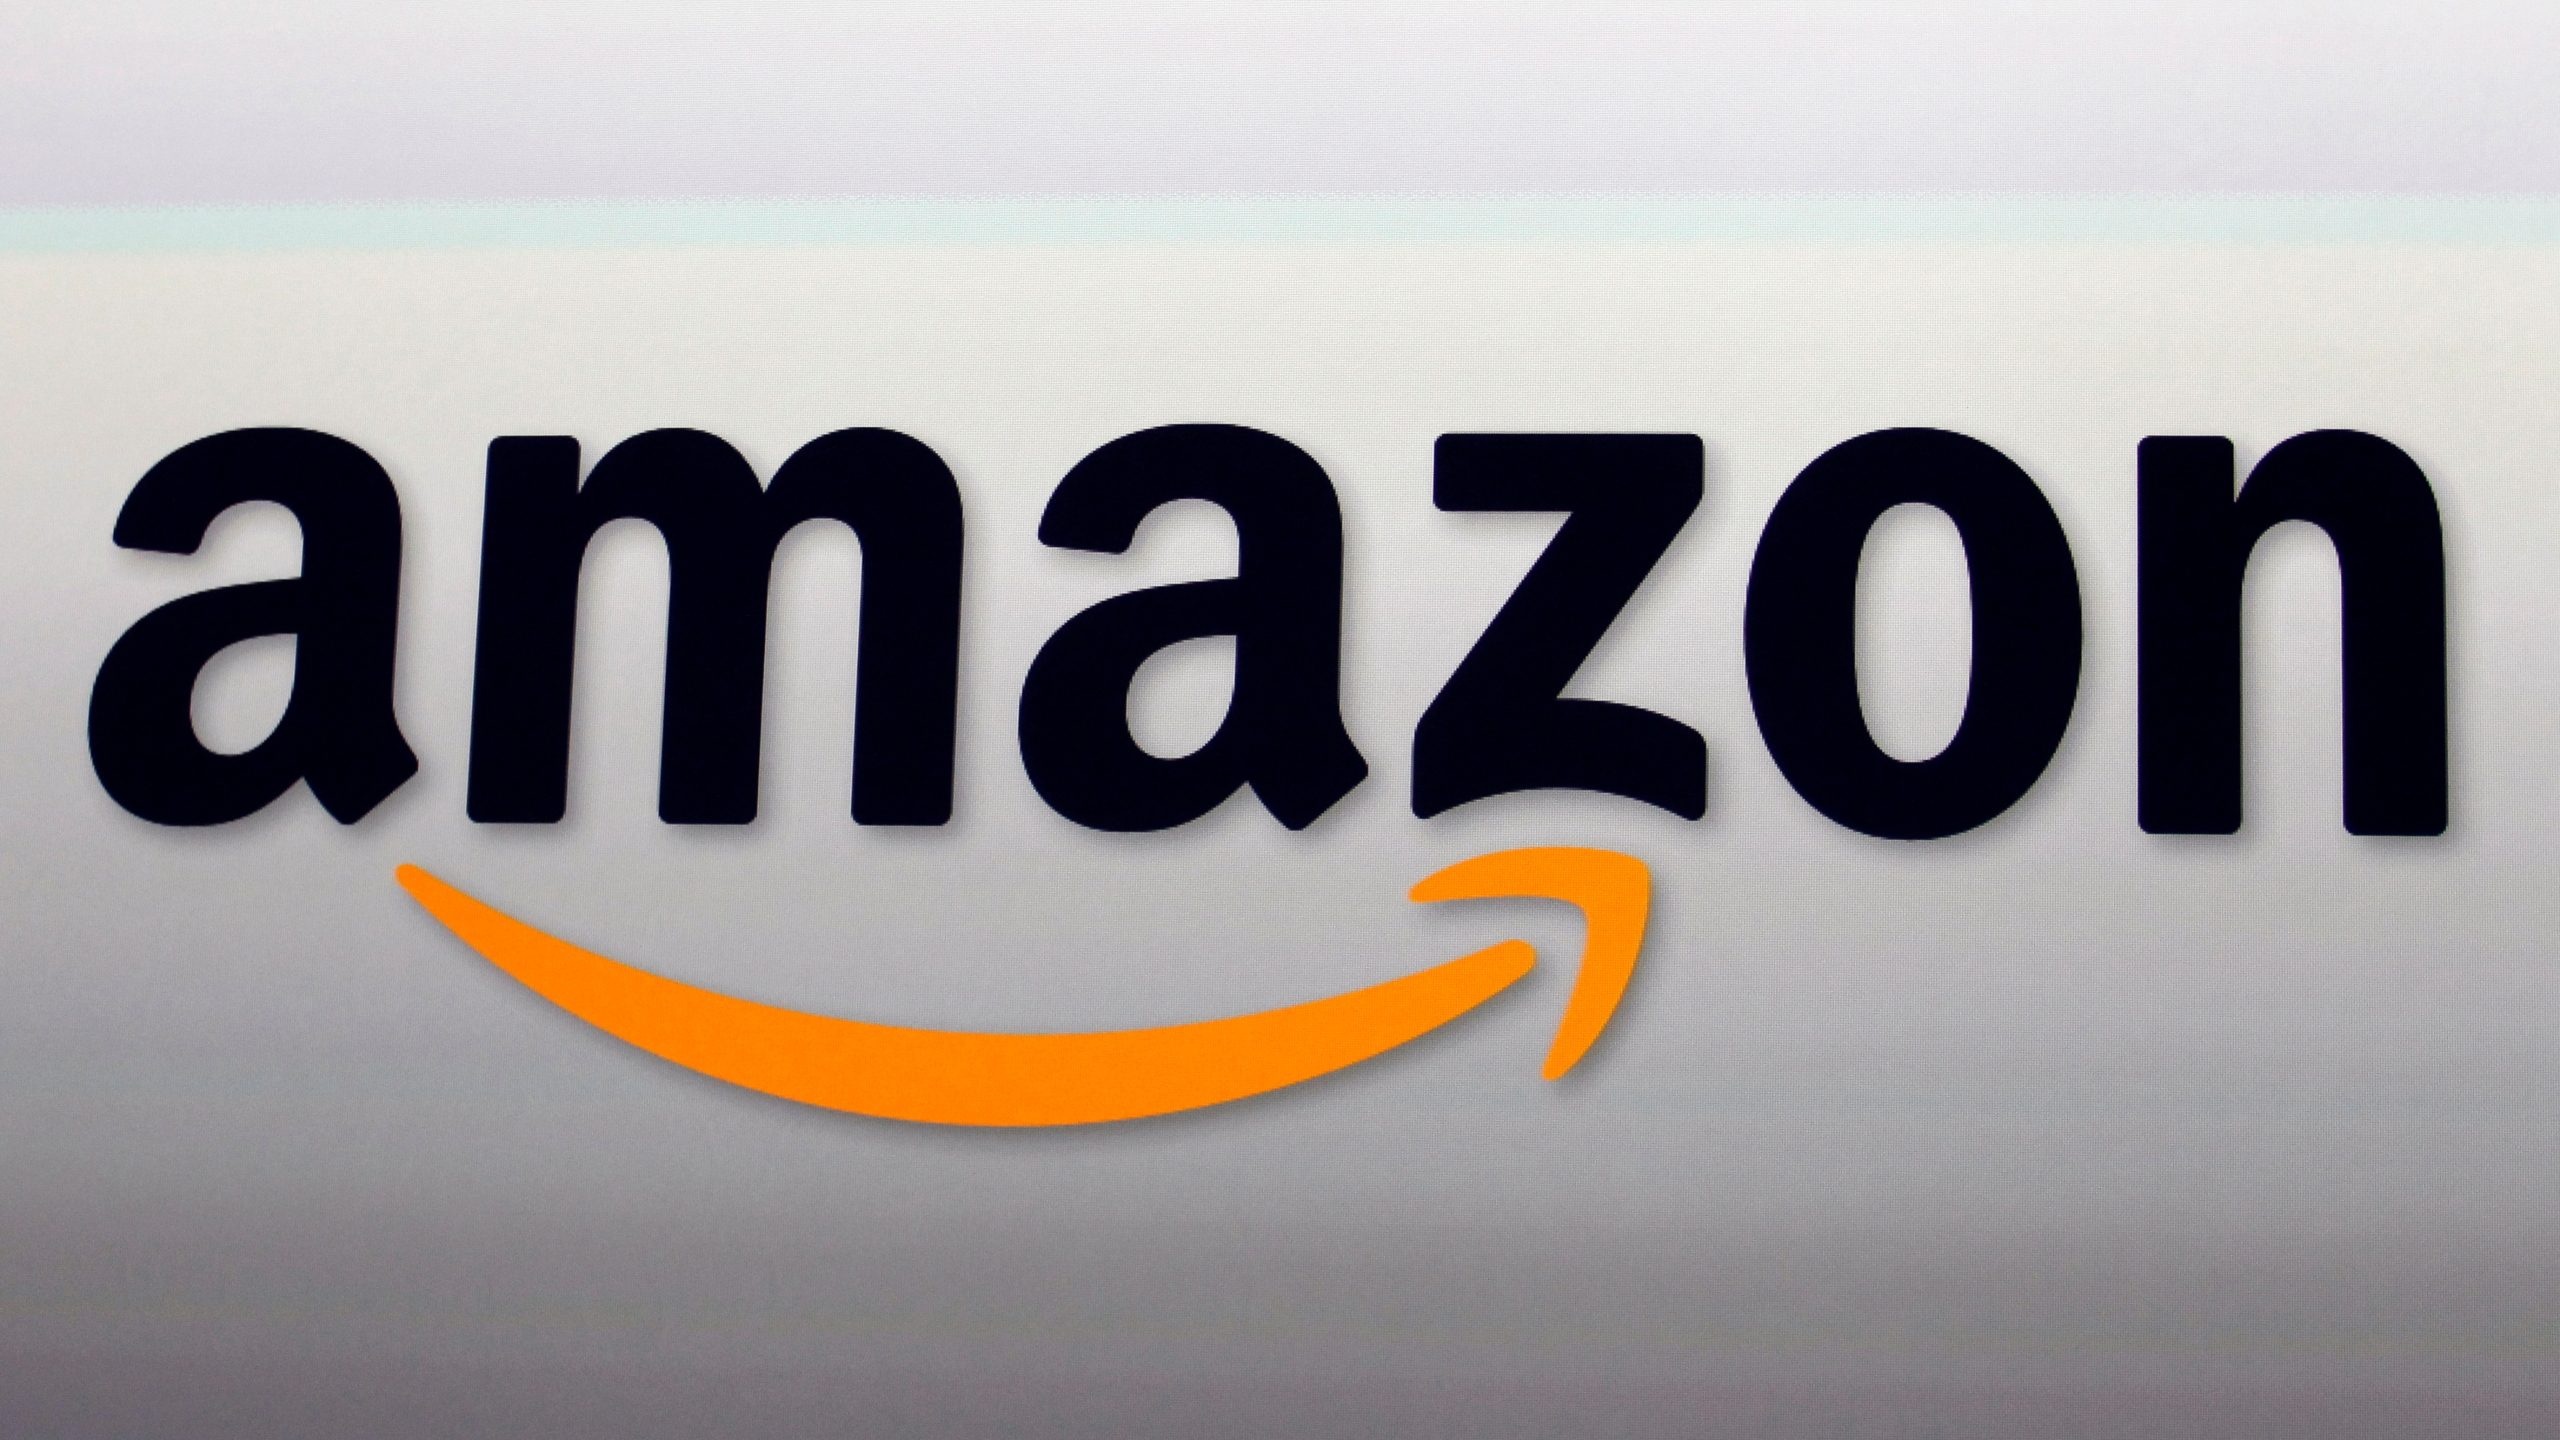 US_Amazon_HQ_77564-159532.jpg32041735